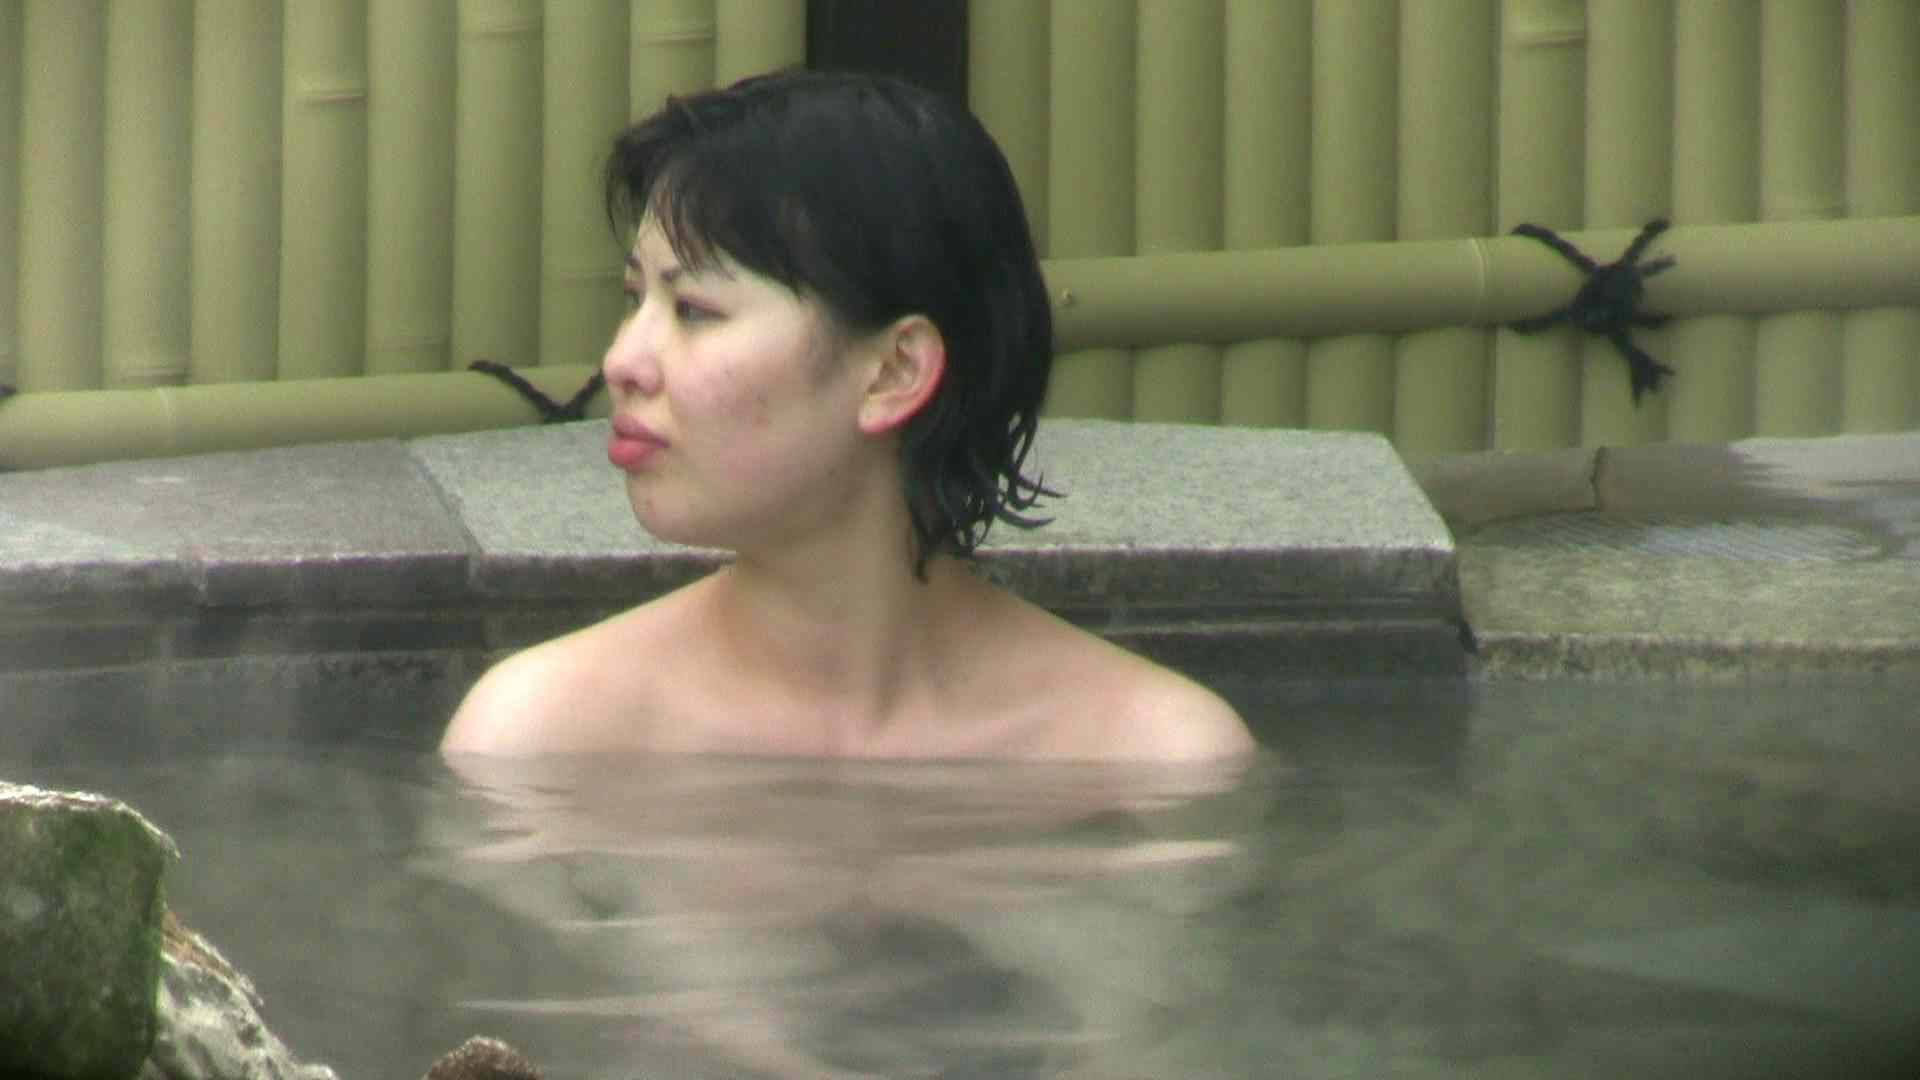 Aquaな露天風呂Vol.114 盗撮映像  72Pix 3